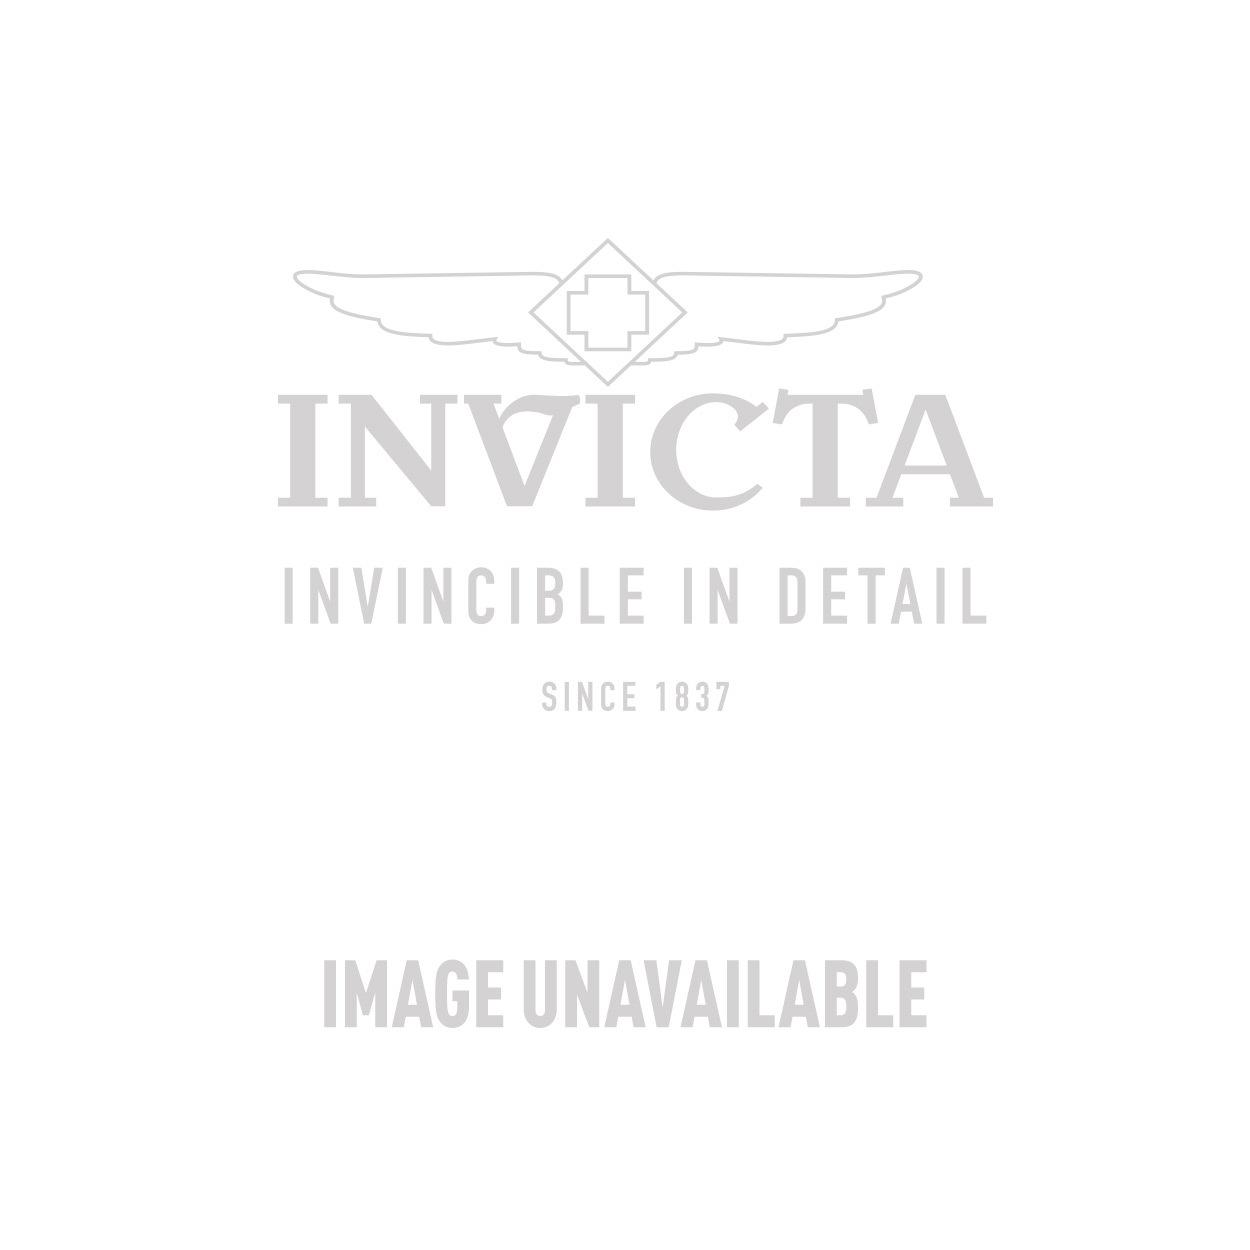 Invicta Sea Hunter Swiss Made Quartz Watch - Gunmetal case with Black tone Polyurethane band - Model 1065